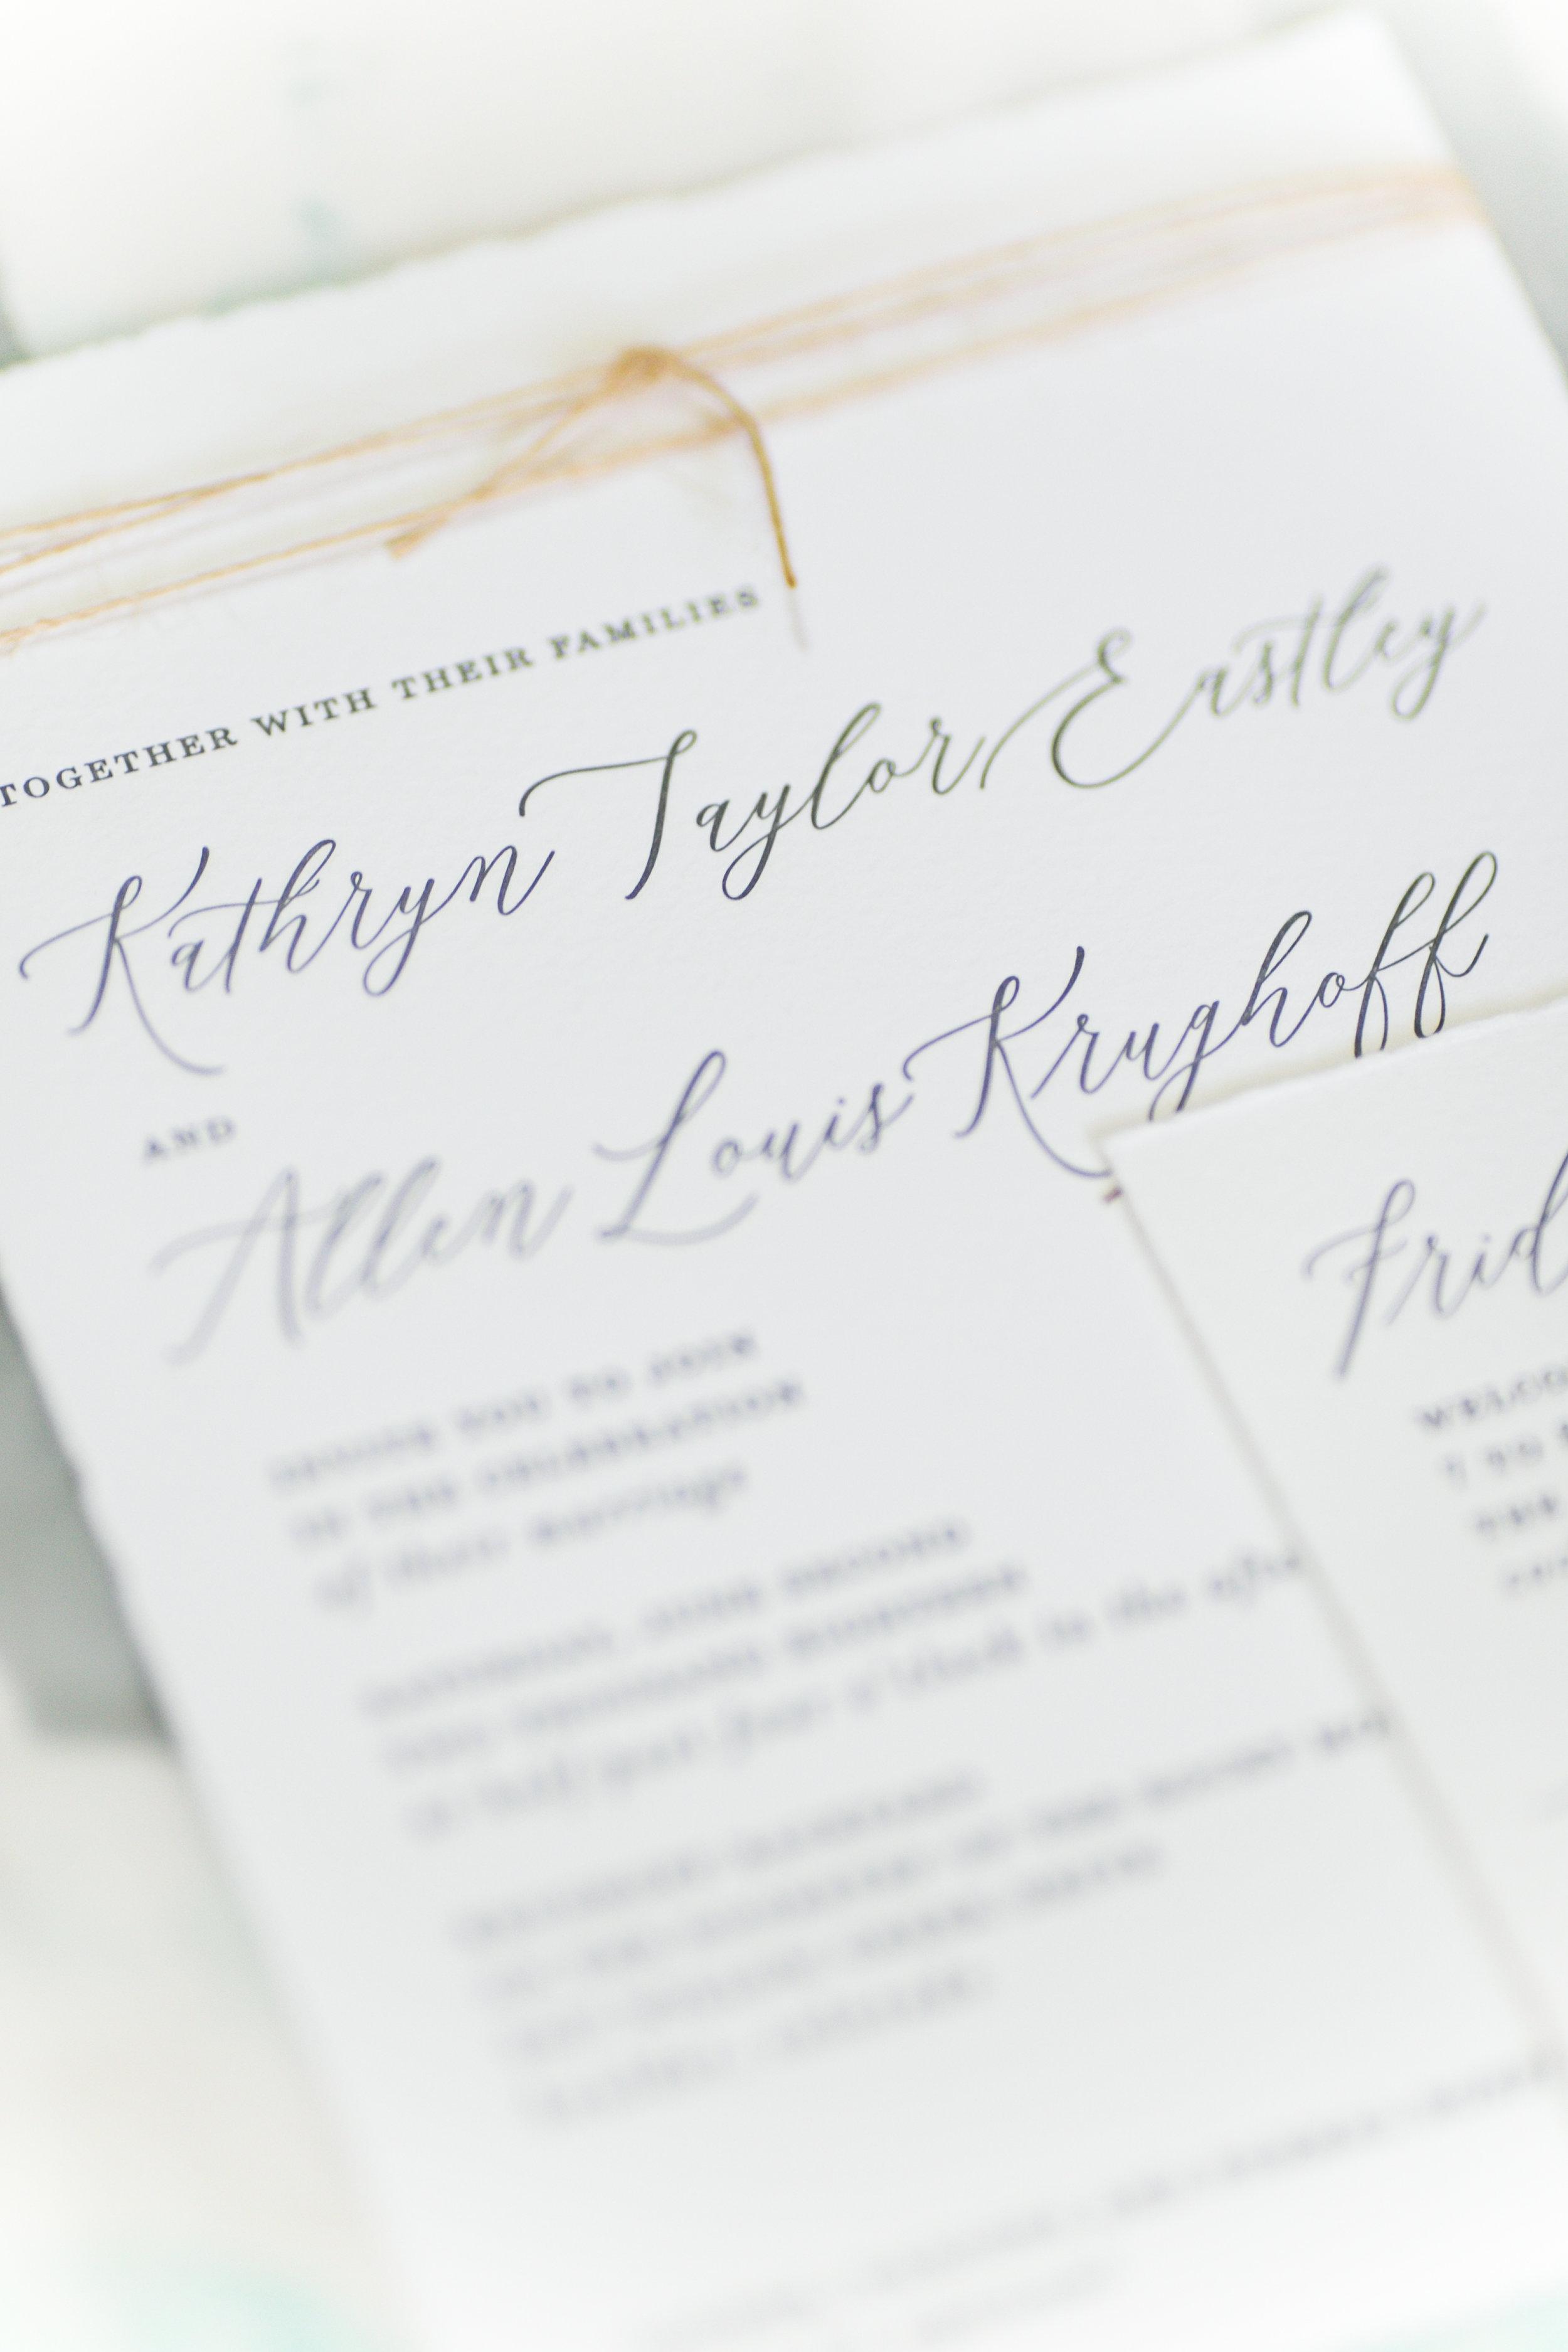 Kathryn-Allen-Boulder-wedding-2018-by-Lisa-ODwyer-673.jpg